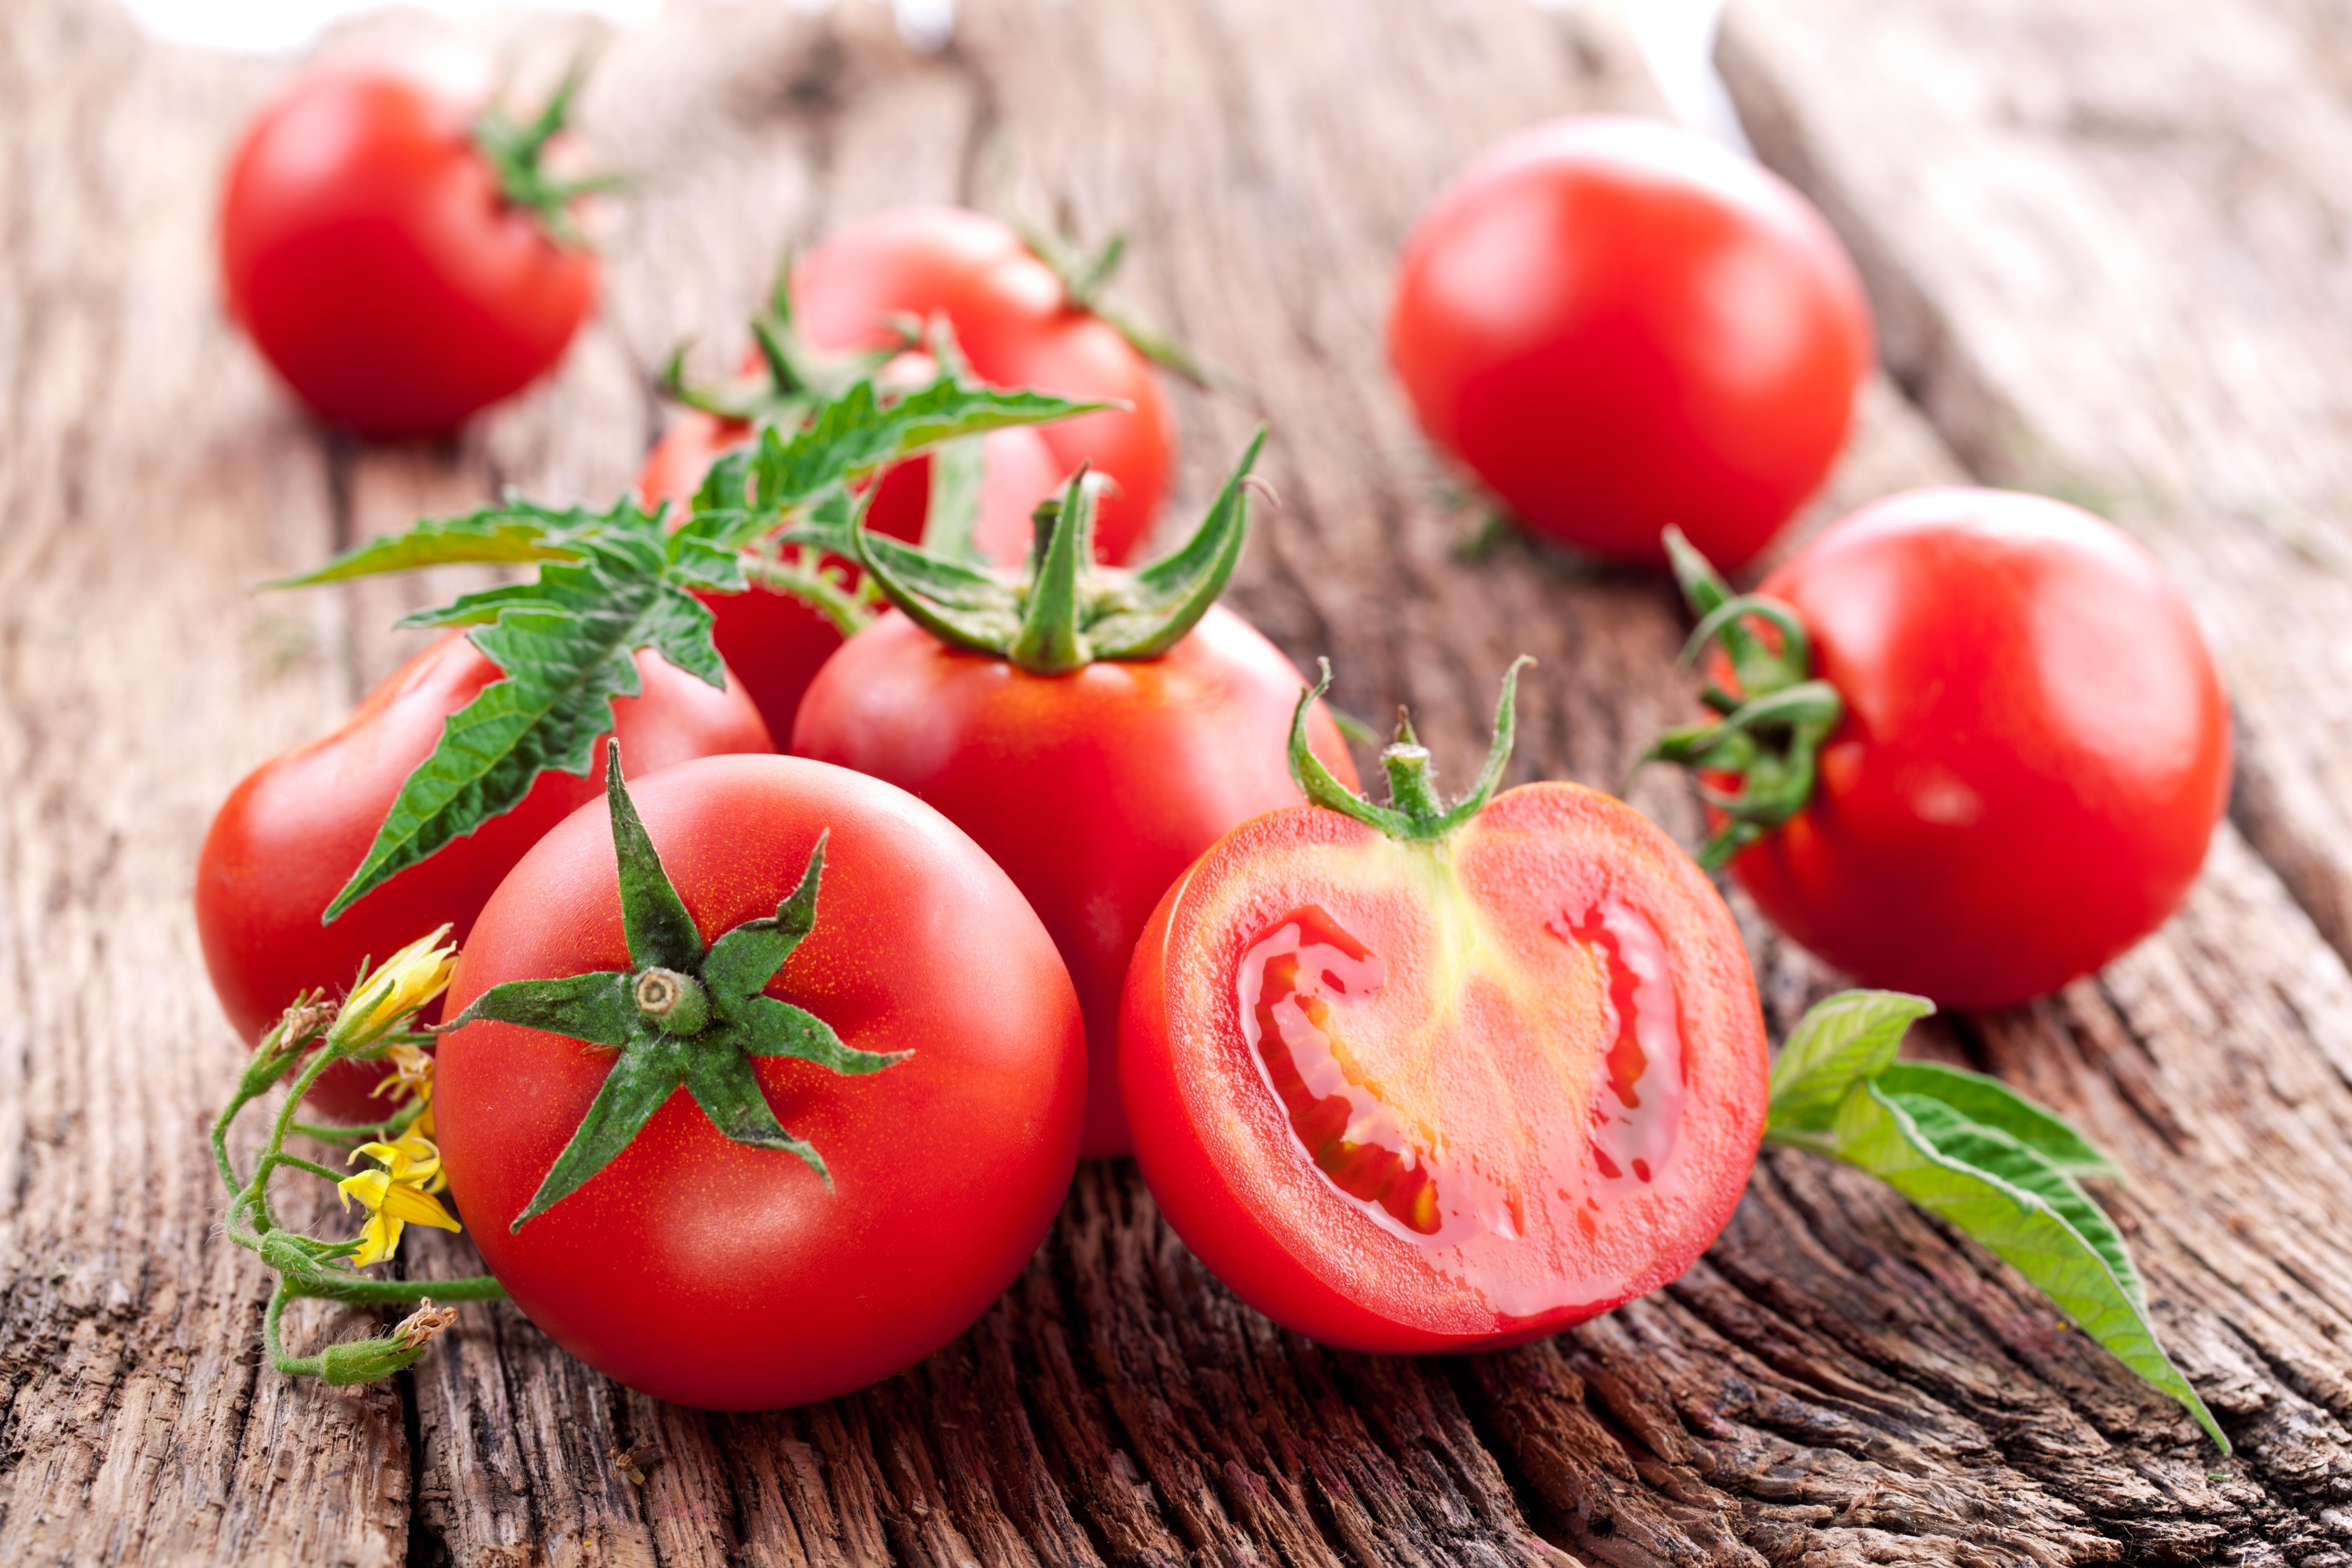 How to Store Fresh Herbs & Veggies | The Fresh Times